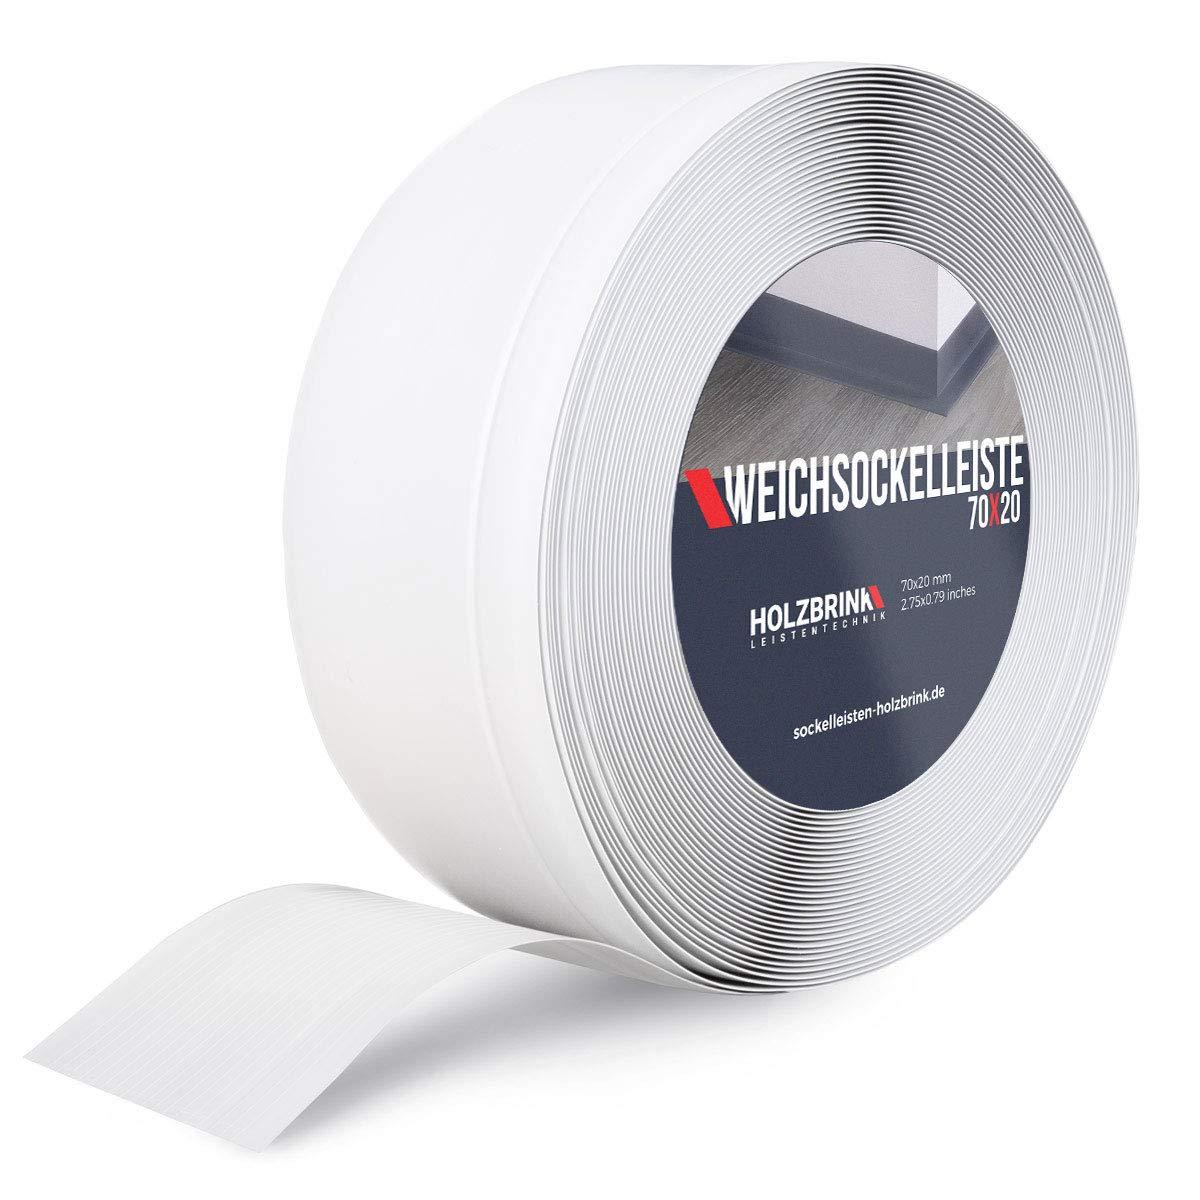 HOLZBRINK Perfil de Remate Suave Blanco Pre Cortado Perfil de PVC, 70x20 mm, 25 m